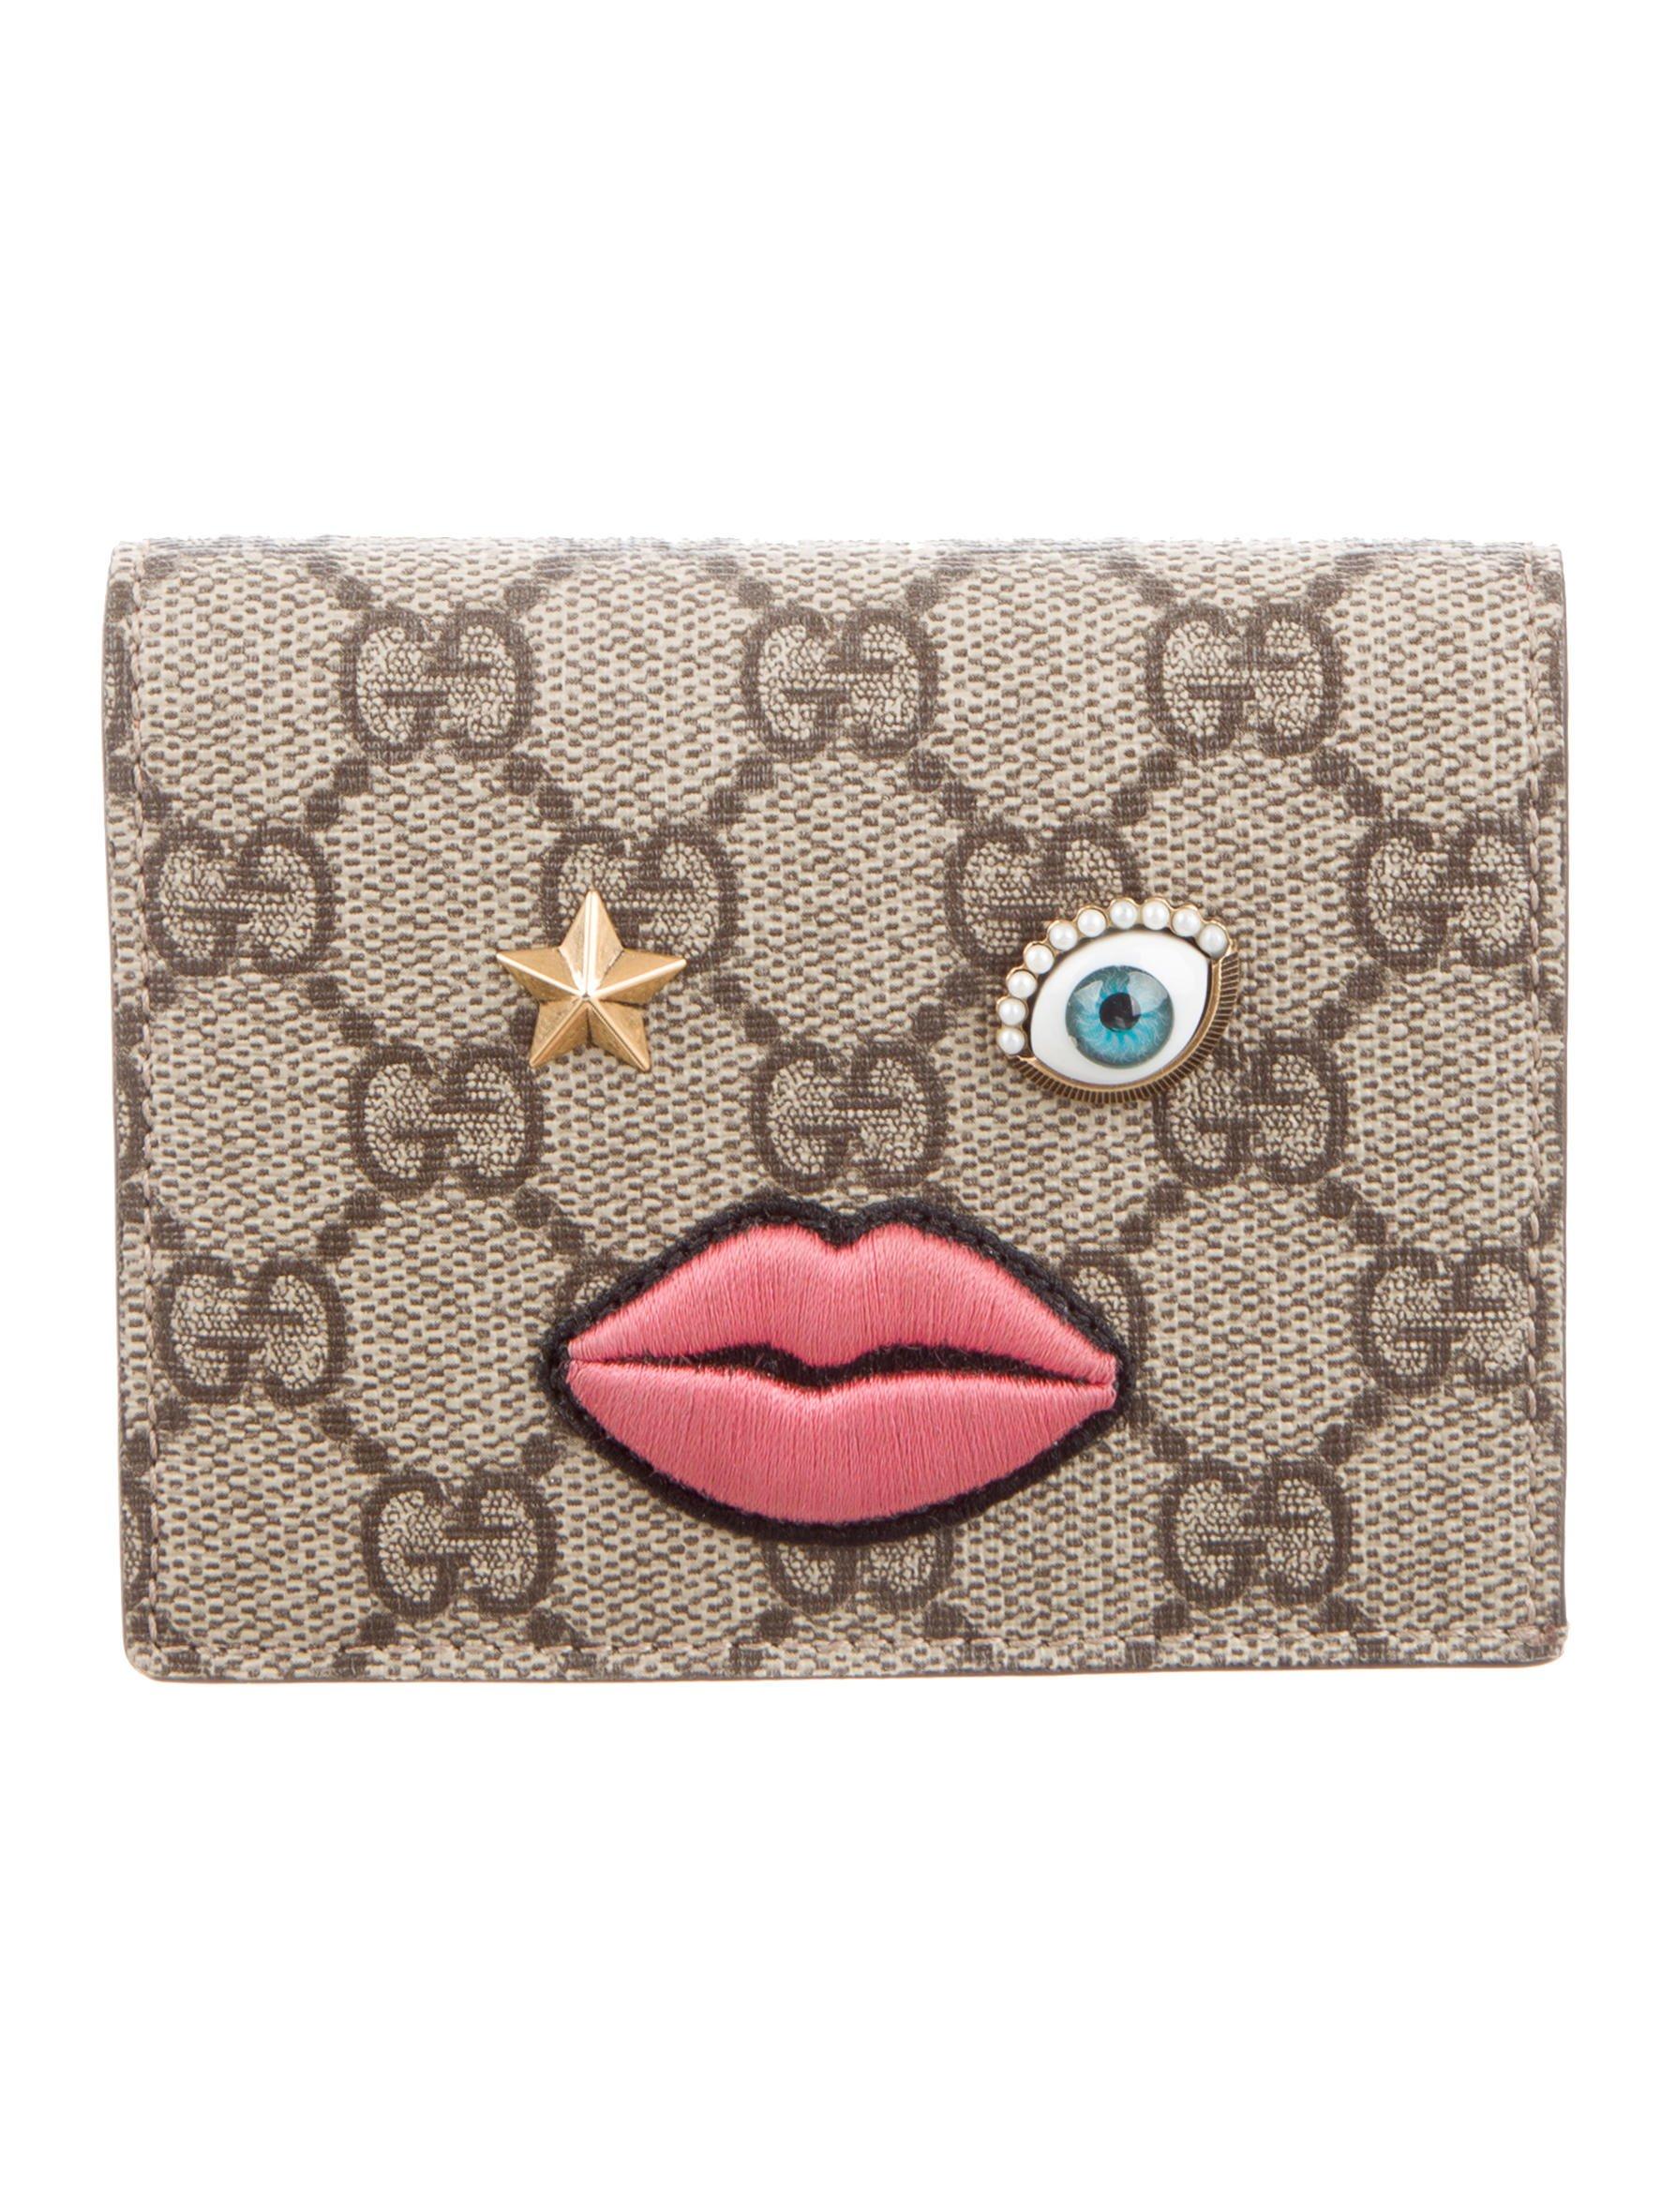 23fe4c2b6a8 Gucci wallets the realreal jpg 220x290 Gucci lip purse